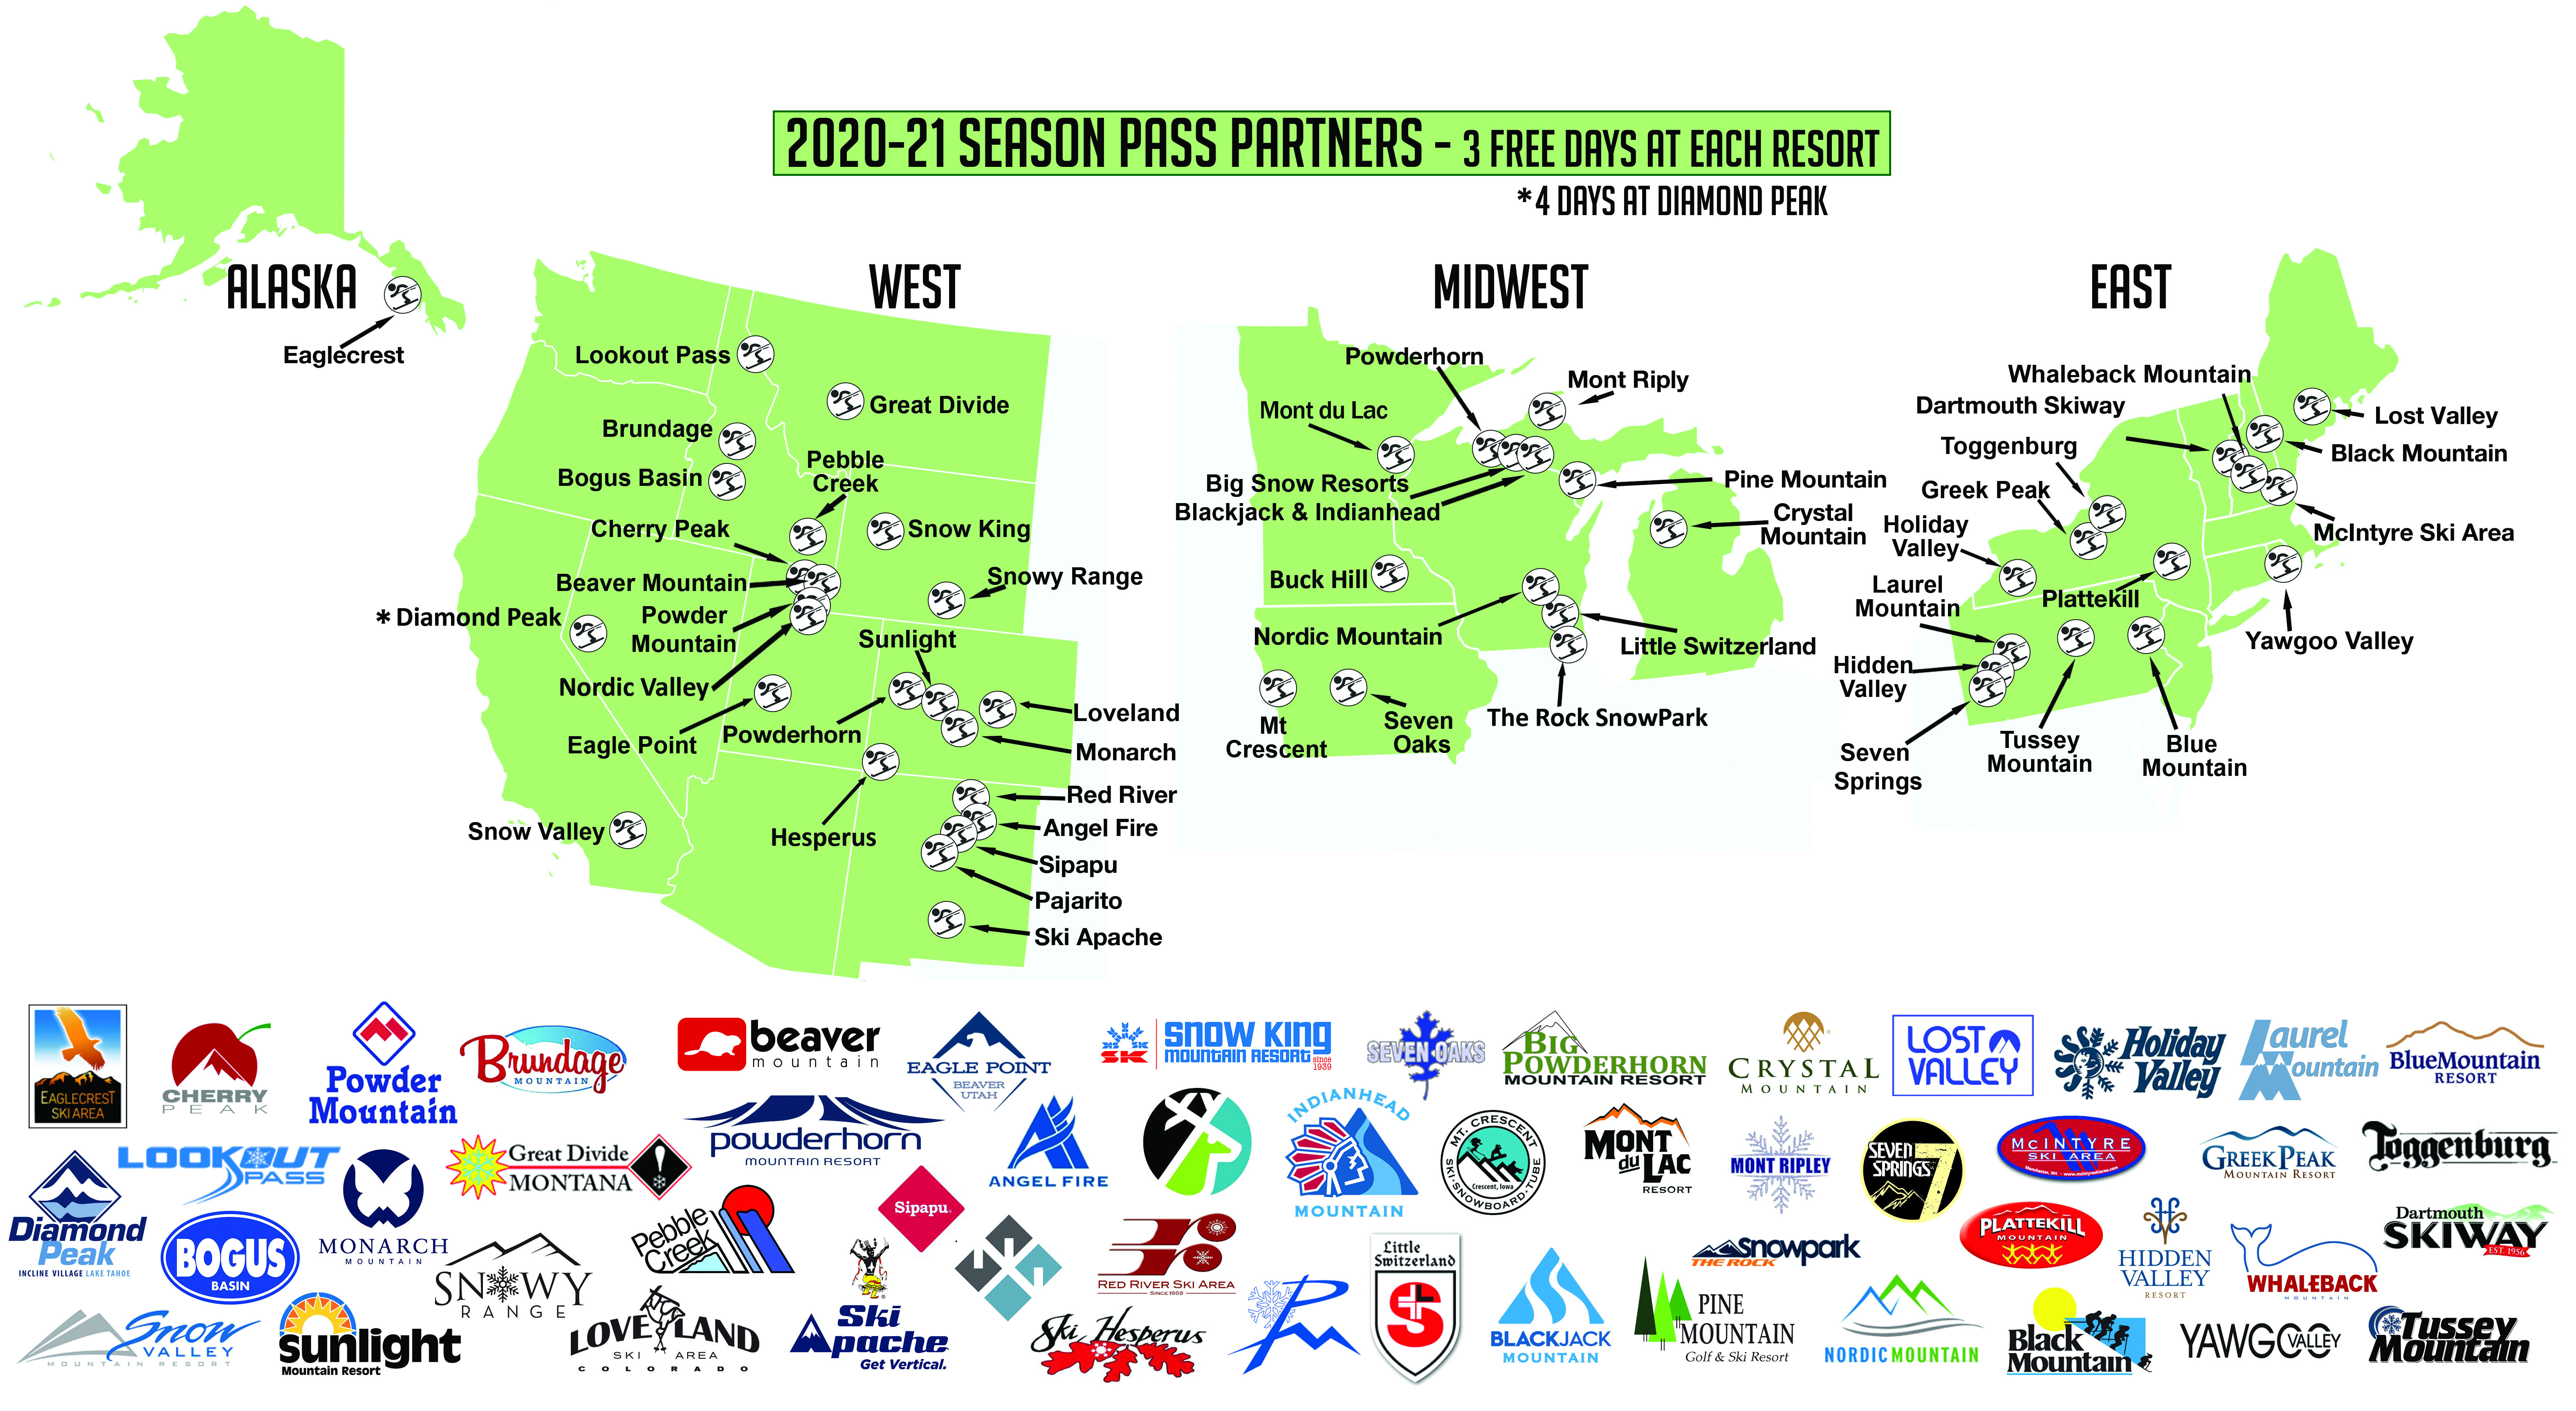 map of season pass partners